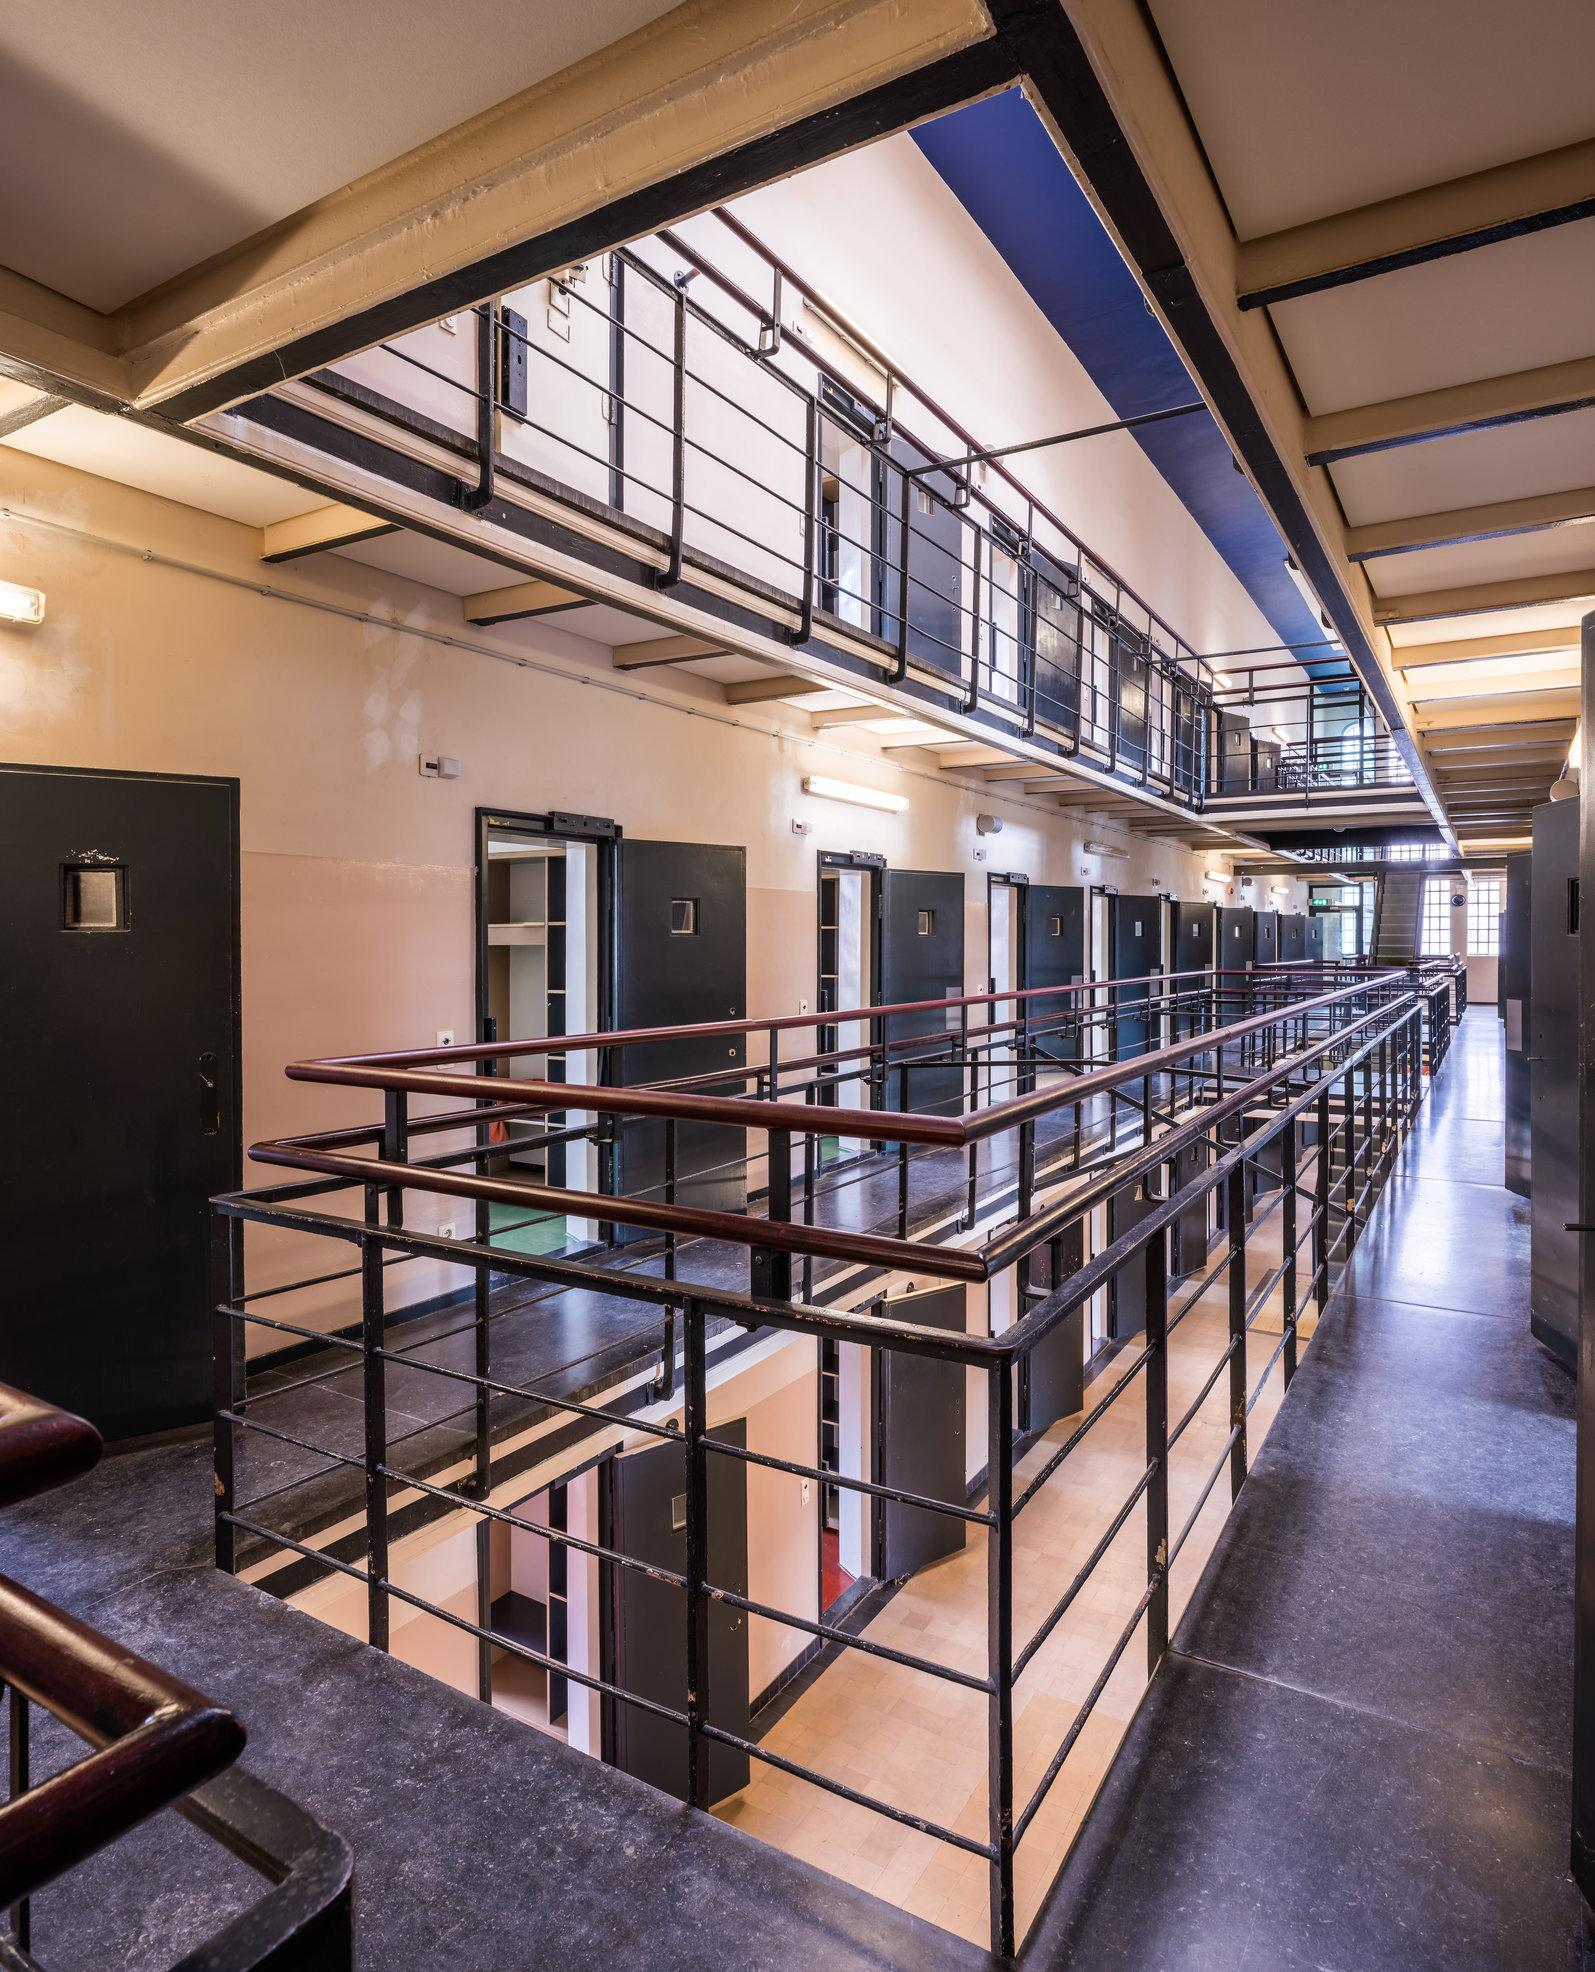 Voormalige penitentiaire Inrichting Wolvenplein